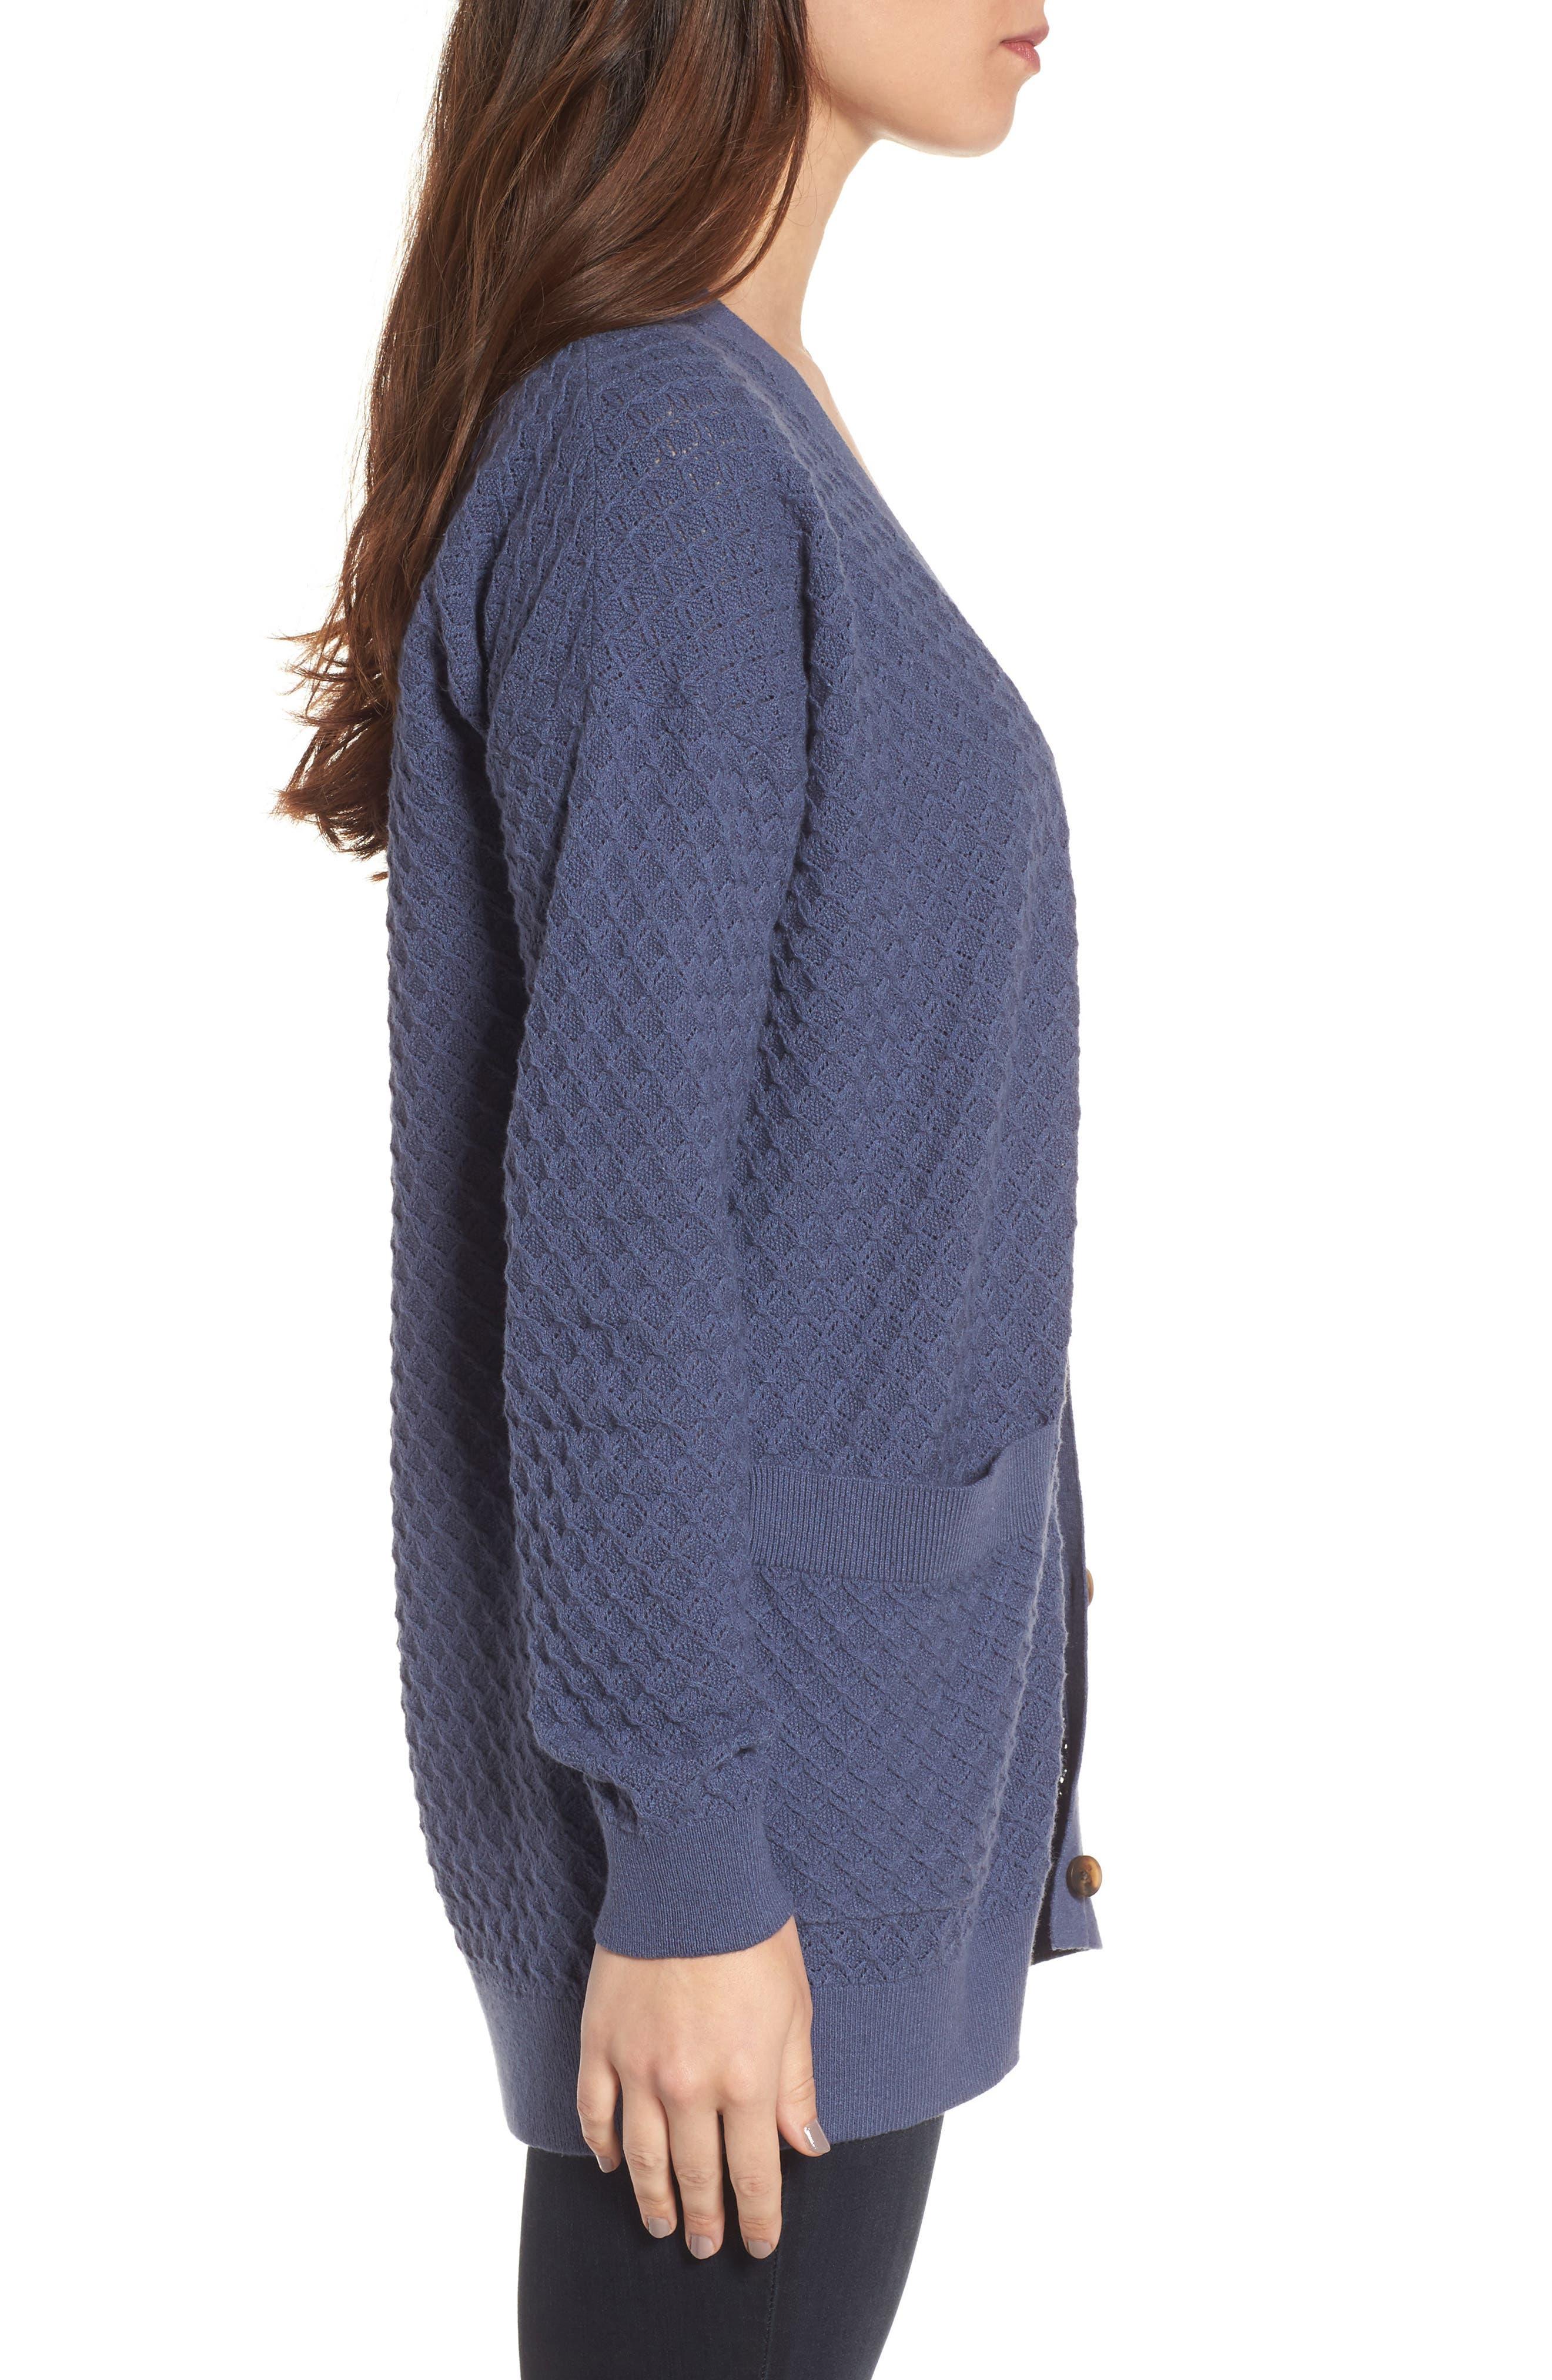 Pointelle Cardigan Sweater,                             Alternate thumbnail 3, color,                             Blue Vintage